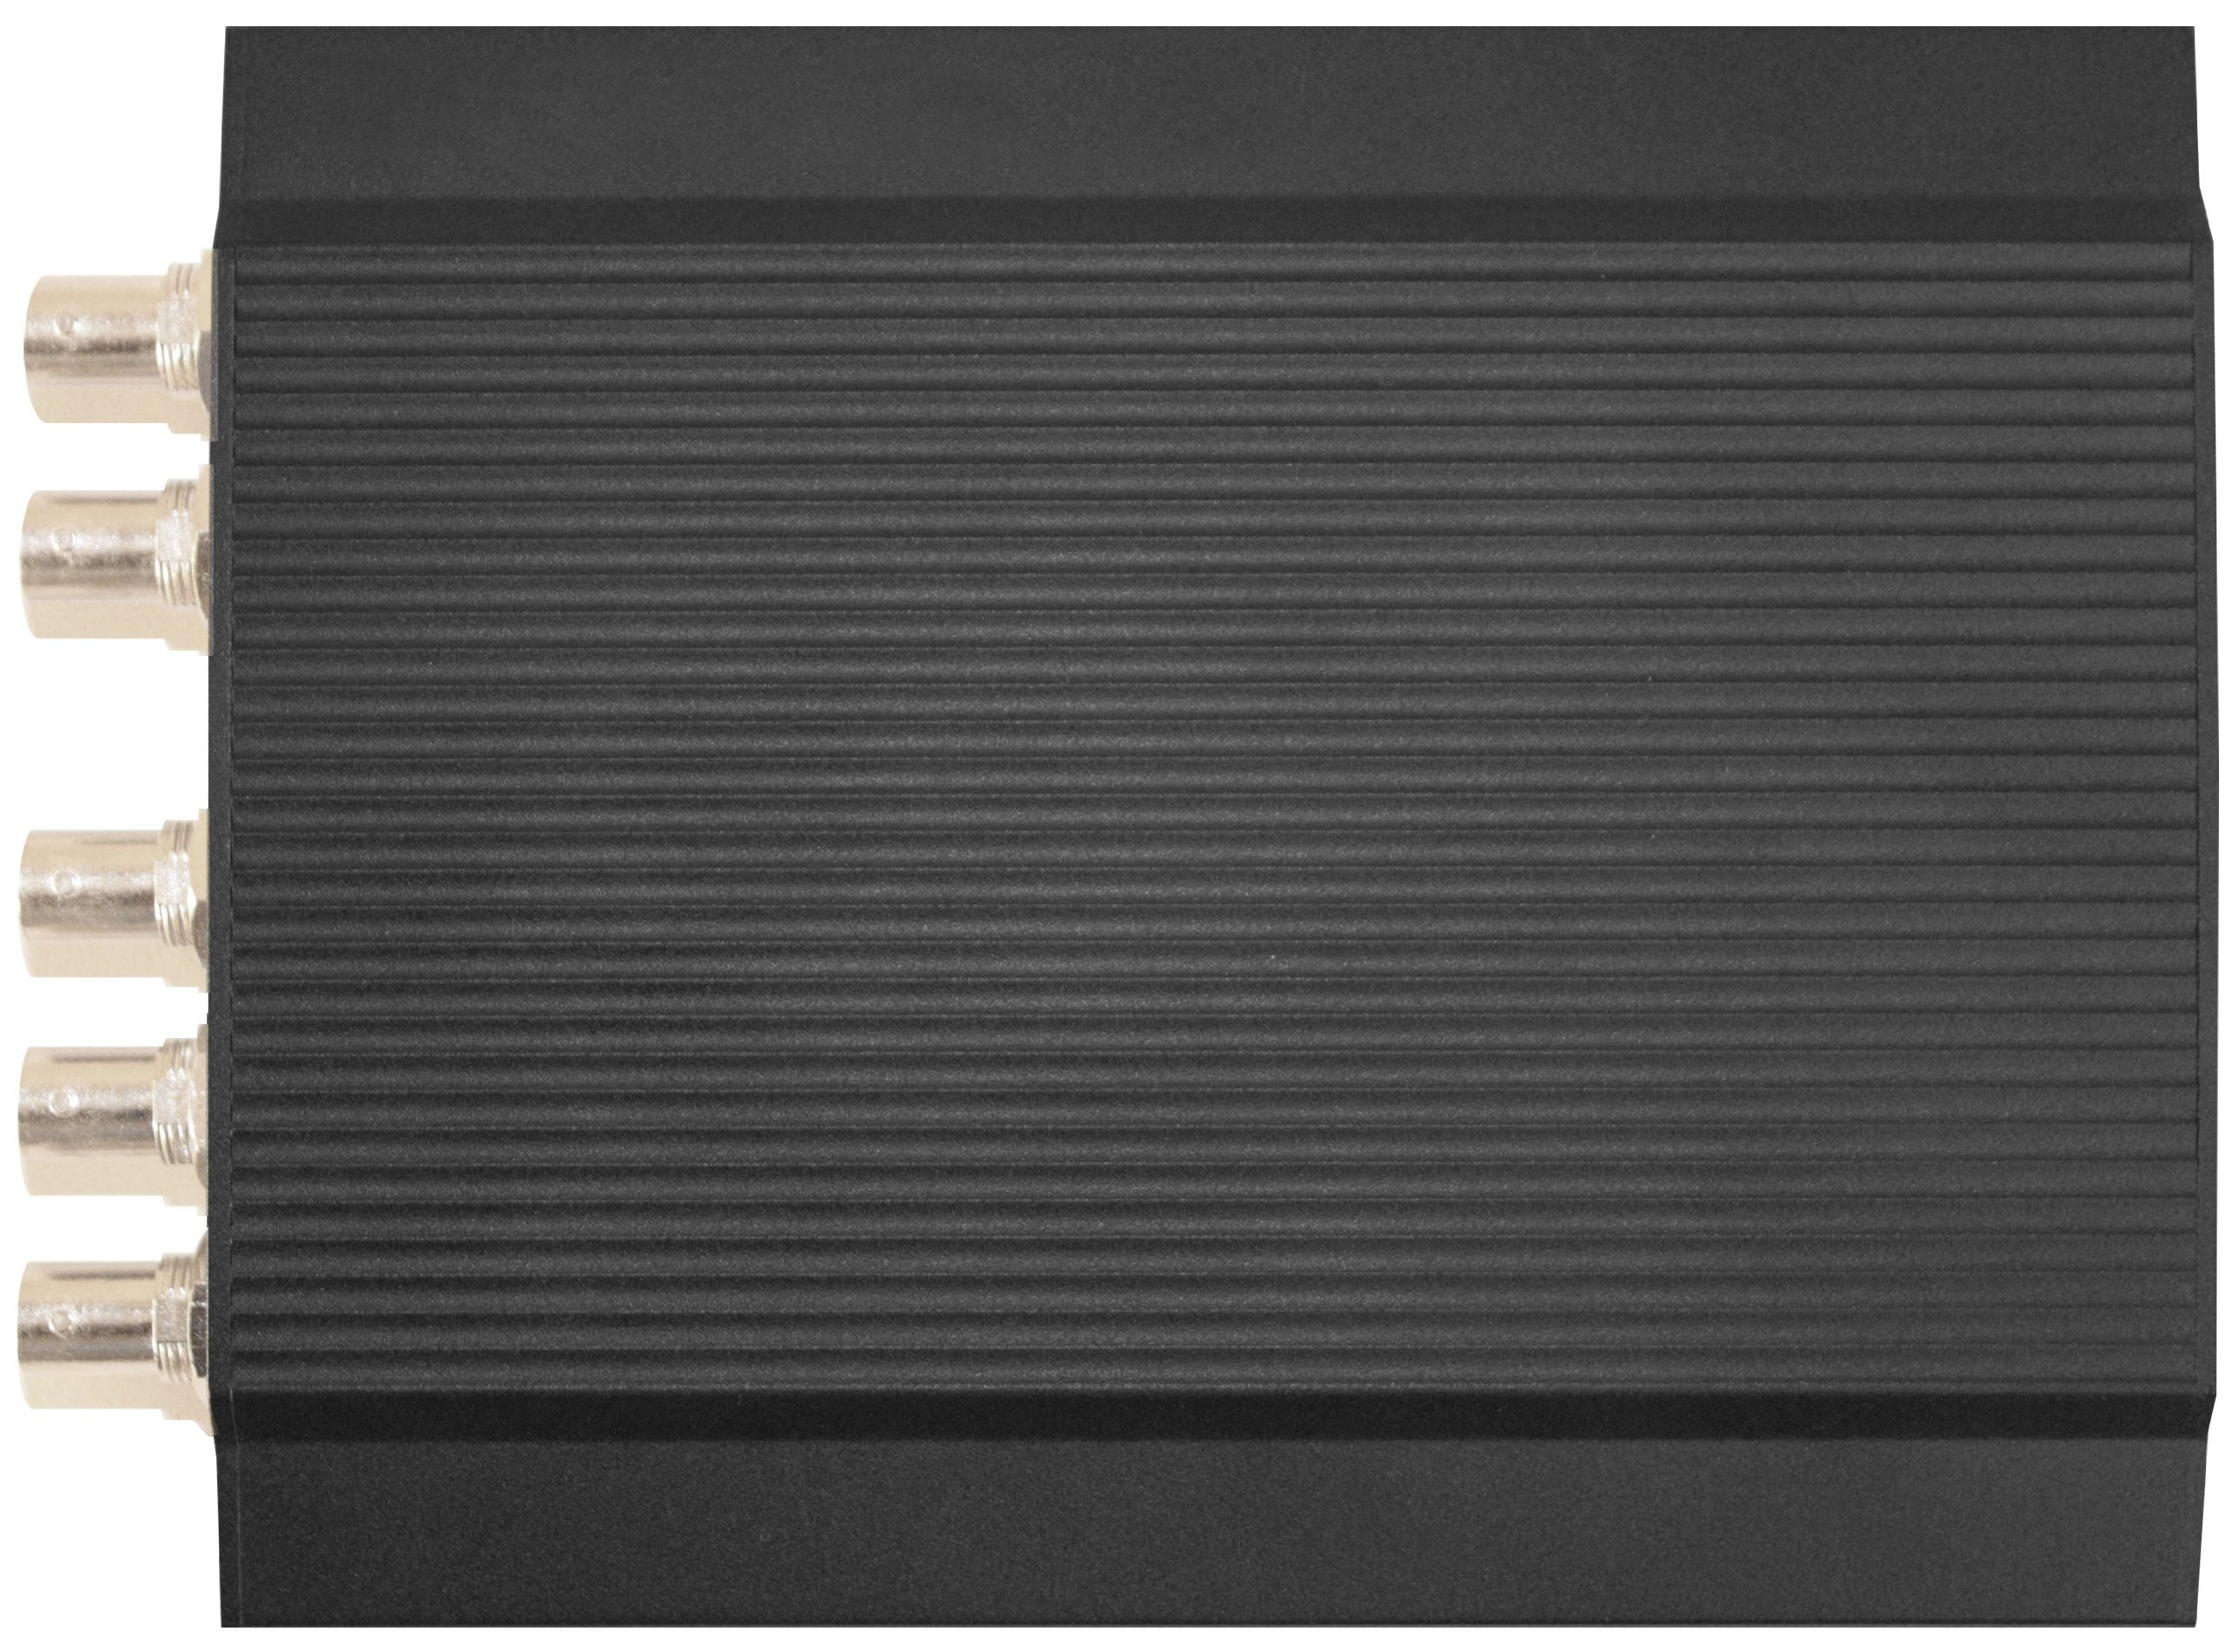 Leviton 87A00-1 Camera Server by Leviton (Image #1)